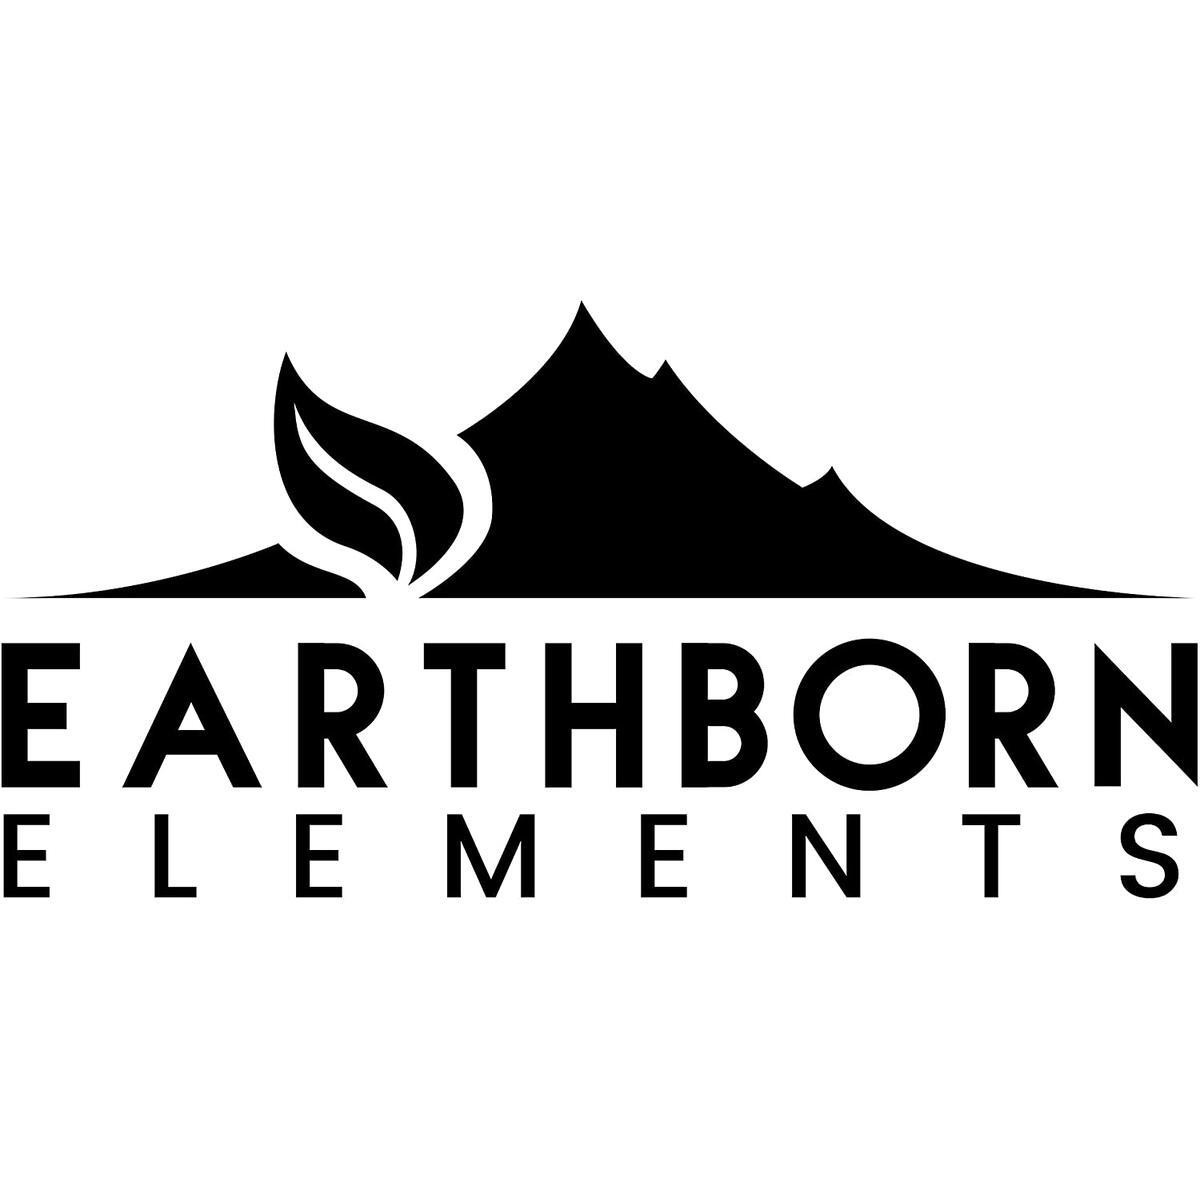 Earthborn Elements Snow & Ice Melt Pellets (5 Gallon), PET-Safe, Concrete Safe, 90% Pure Calcium Chloride, Deicer, Fast Acting, Exothermic Heat, More Effective Than Rock Salt